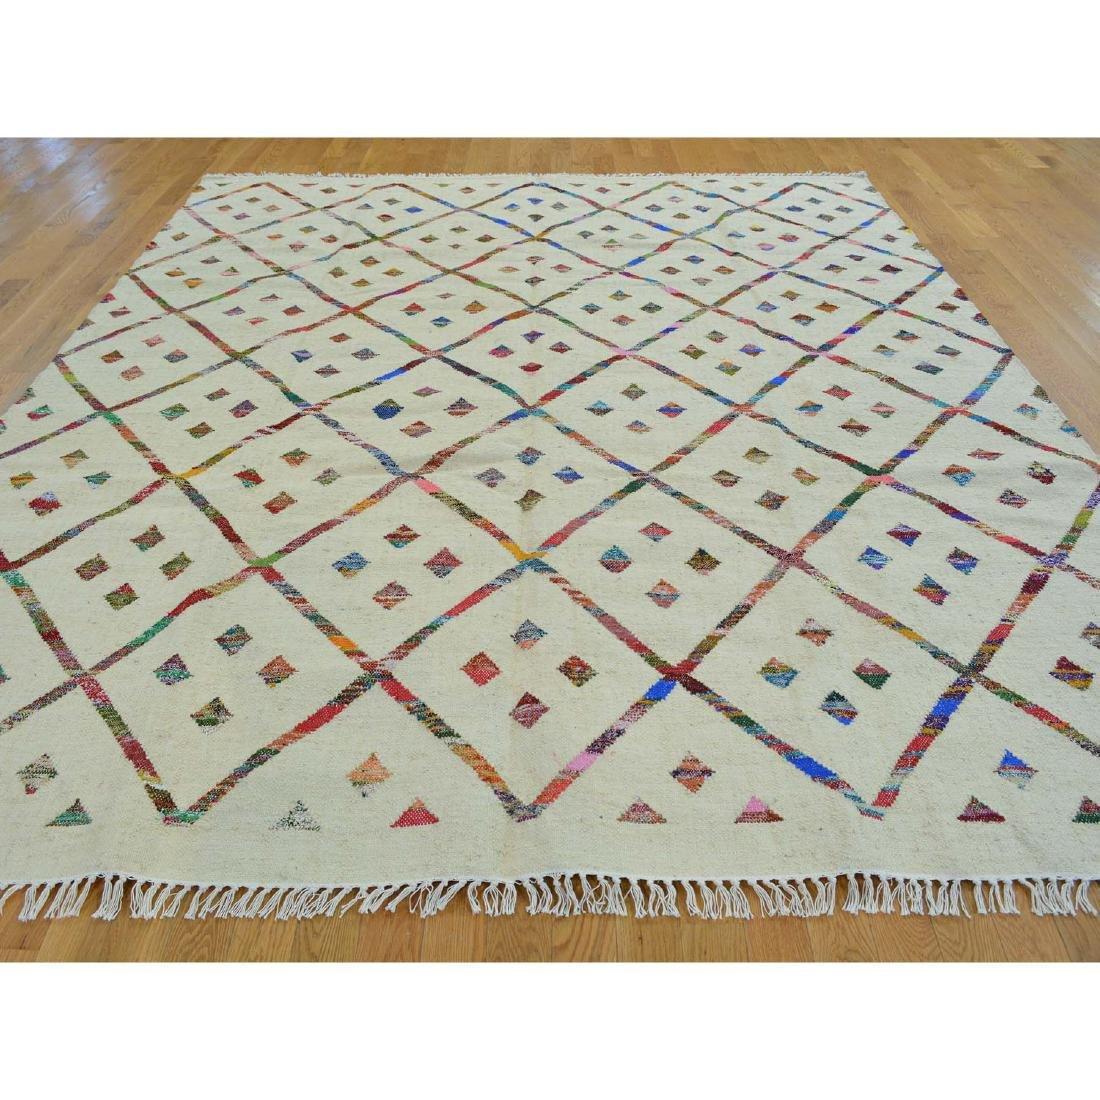 Hand Woven Flat Weave Wool Sari Silk Durie Rug 8.1x9.10 - 2